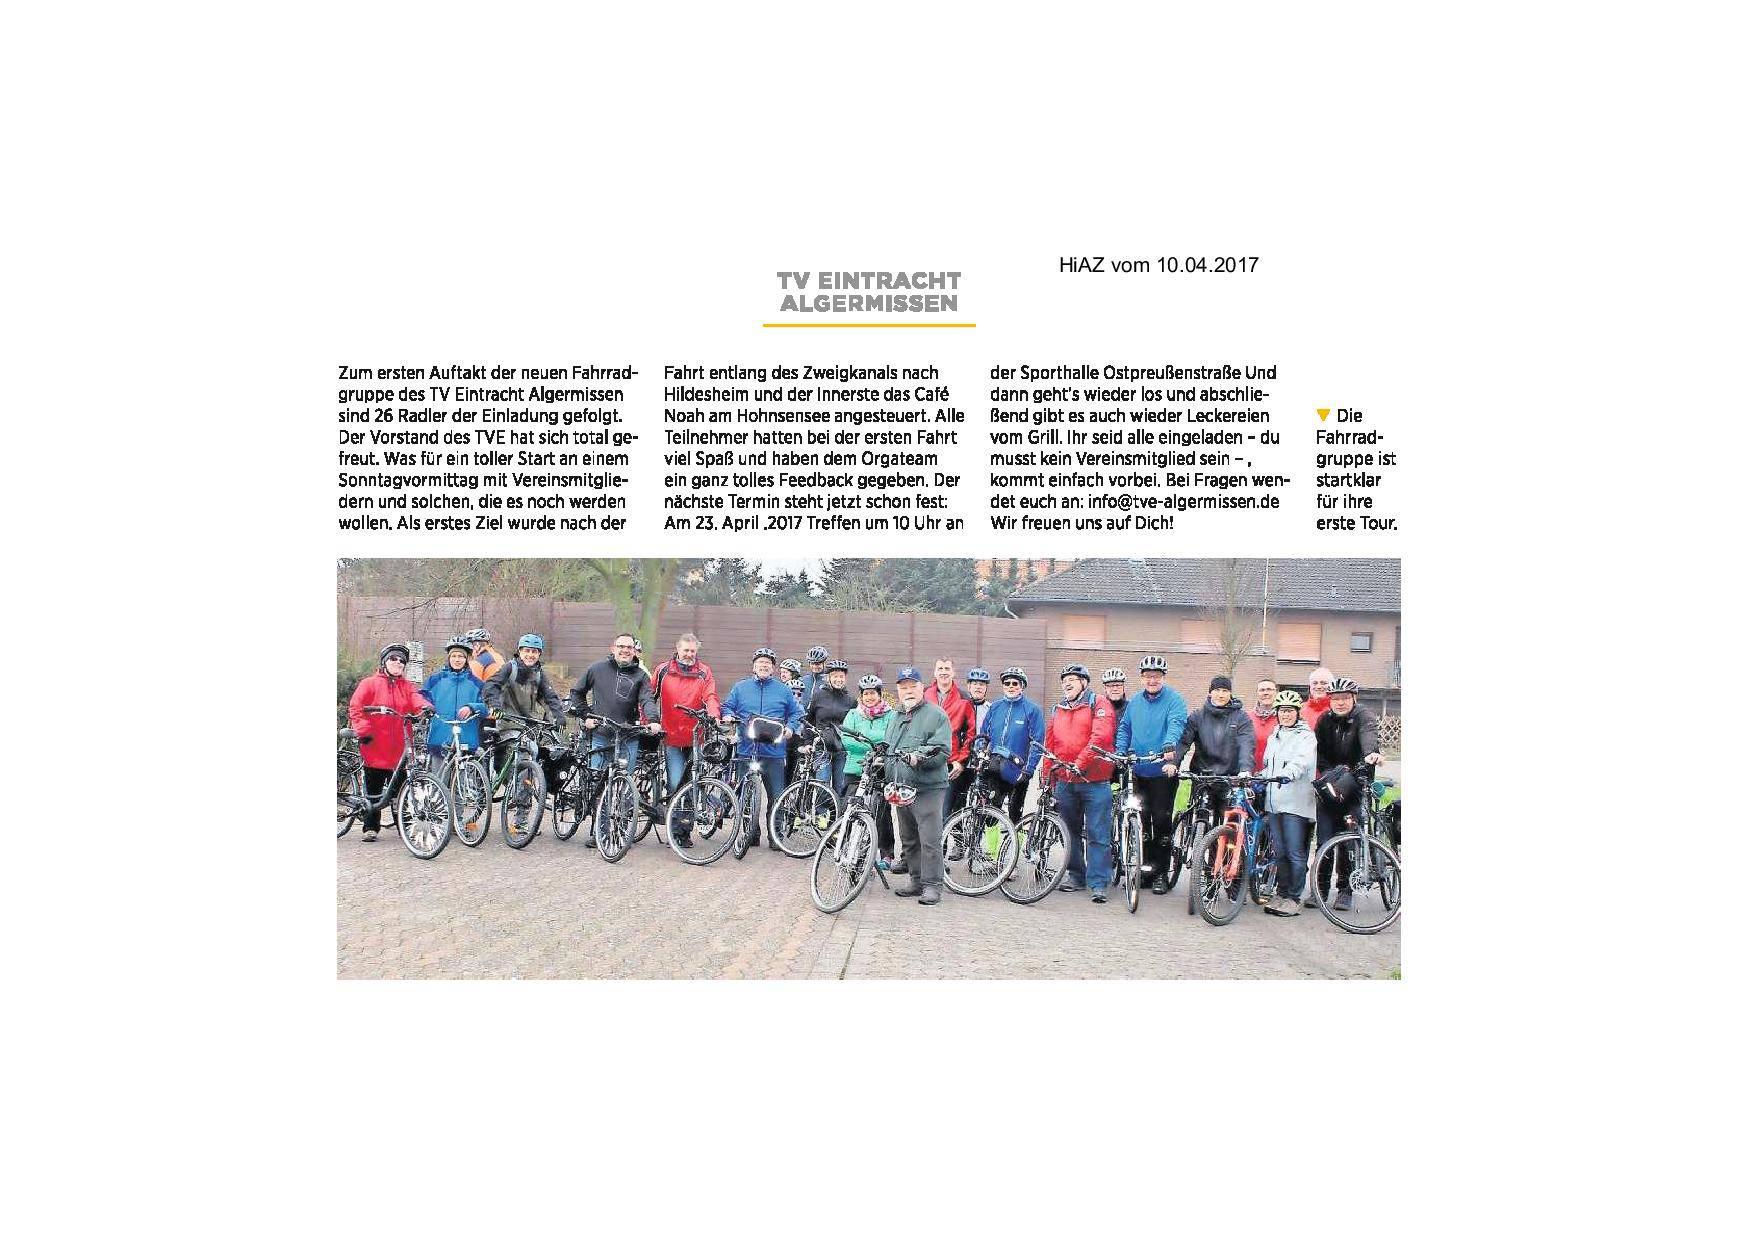 2017_04_10_hiaz_maerz_fahrradtour-page-001